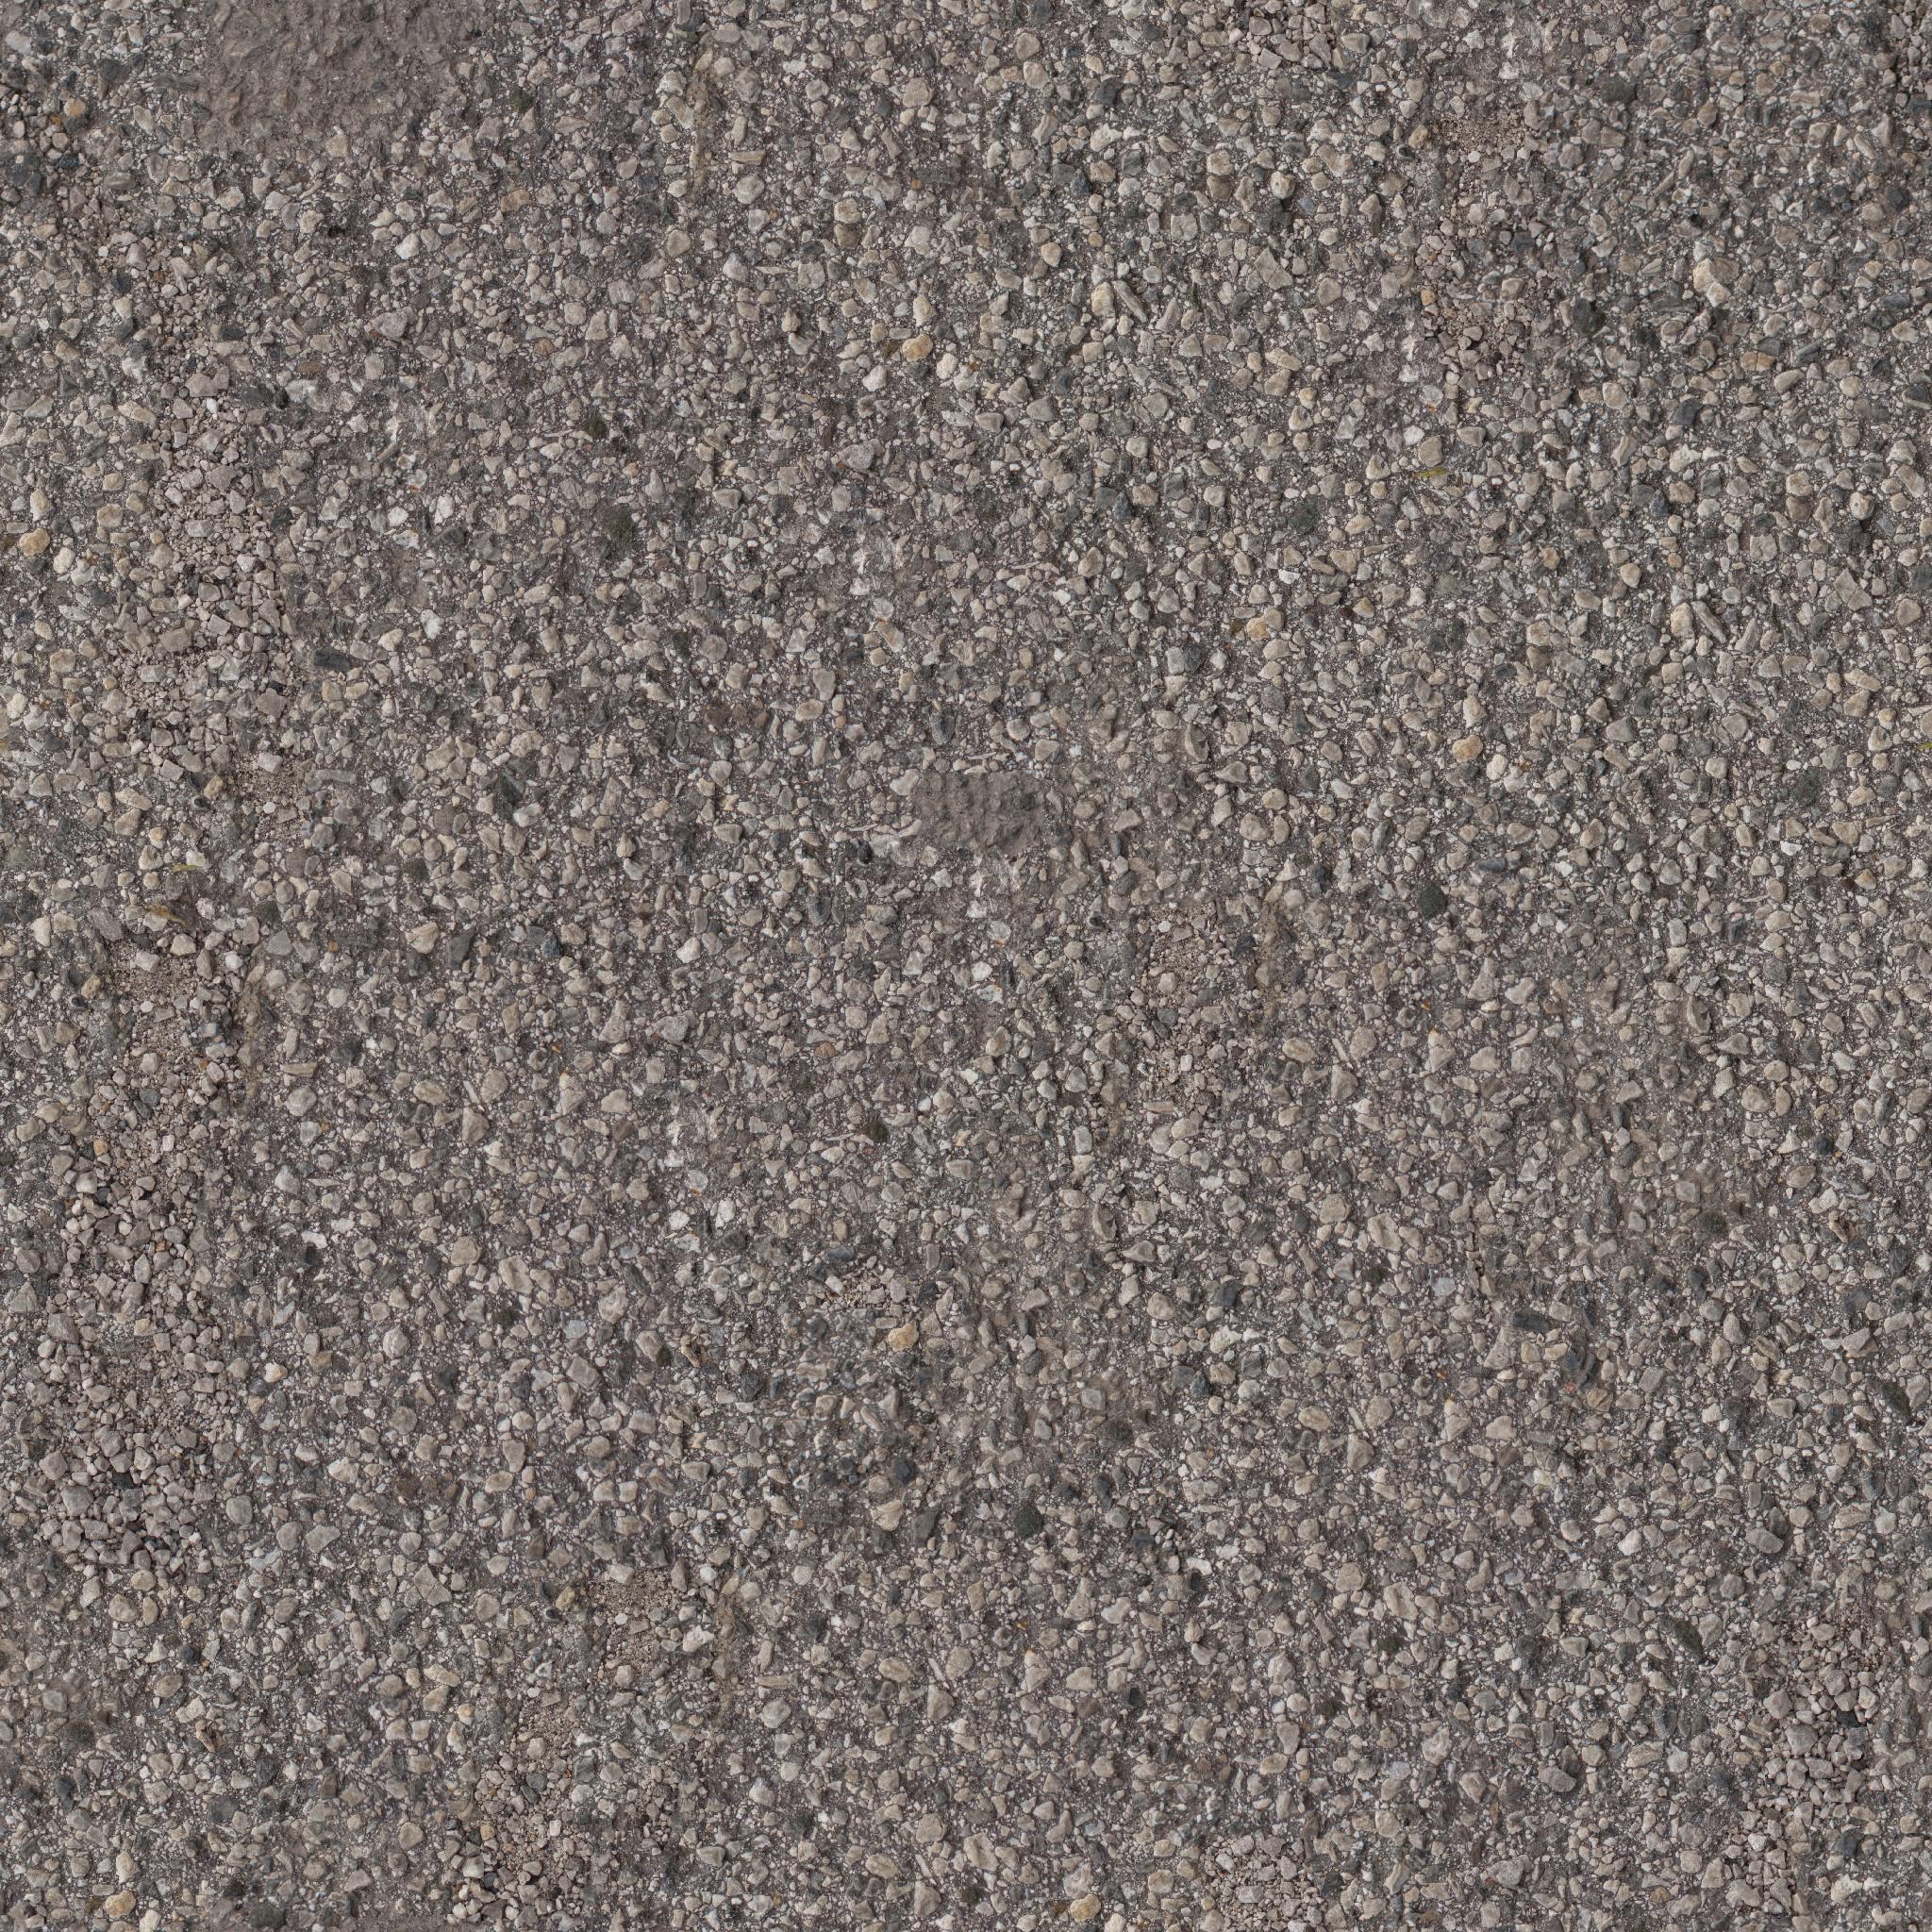 real asphalt texture pack.